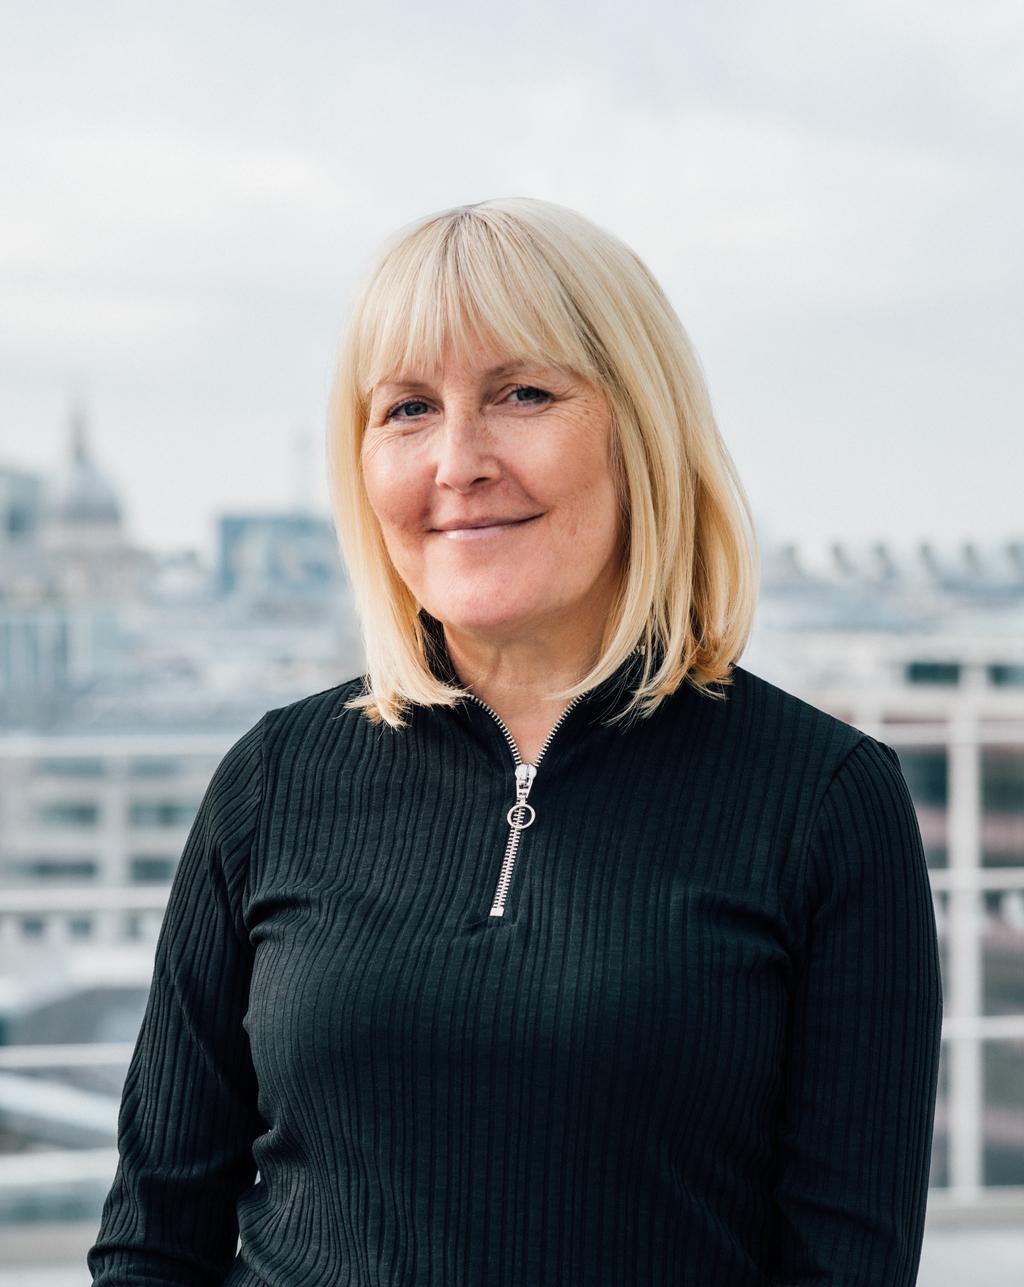 An interview with Women in Insurance Awards winner Lynn Cufley, Crawford & Company